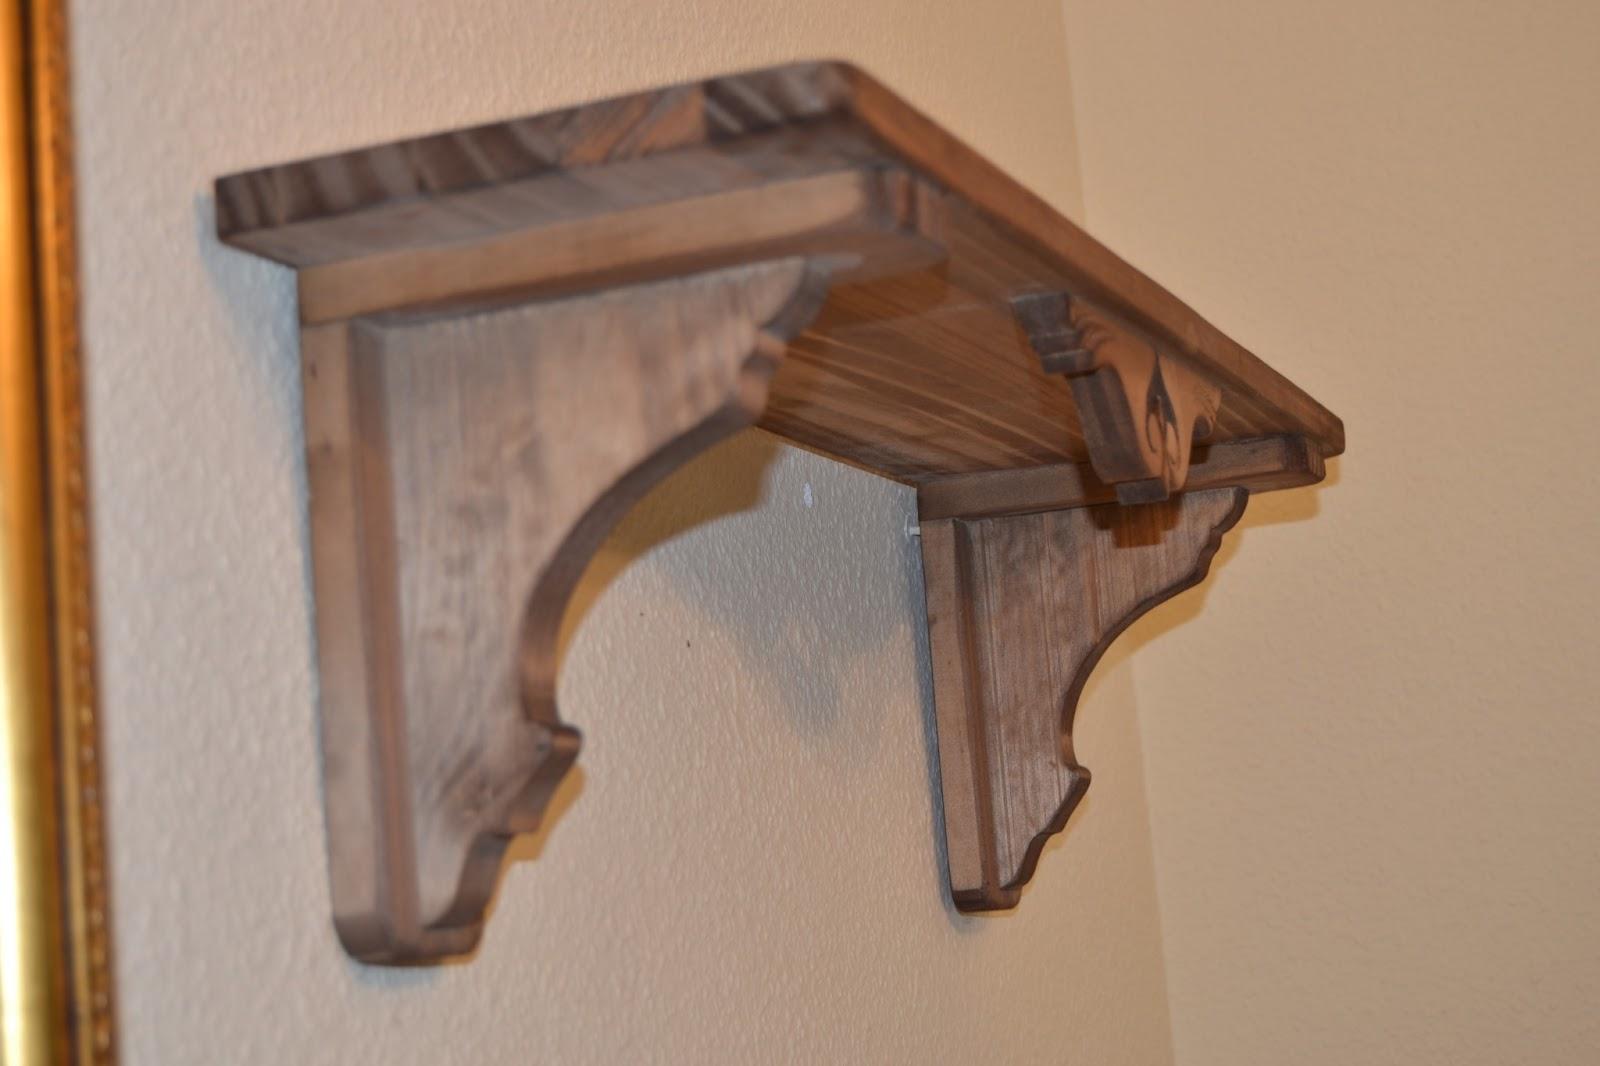 RÚSTICA EN MADERA : Balda de madera para pared tallada. (Art. 070 #CC7000 1600x1066